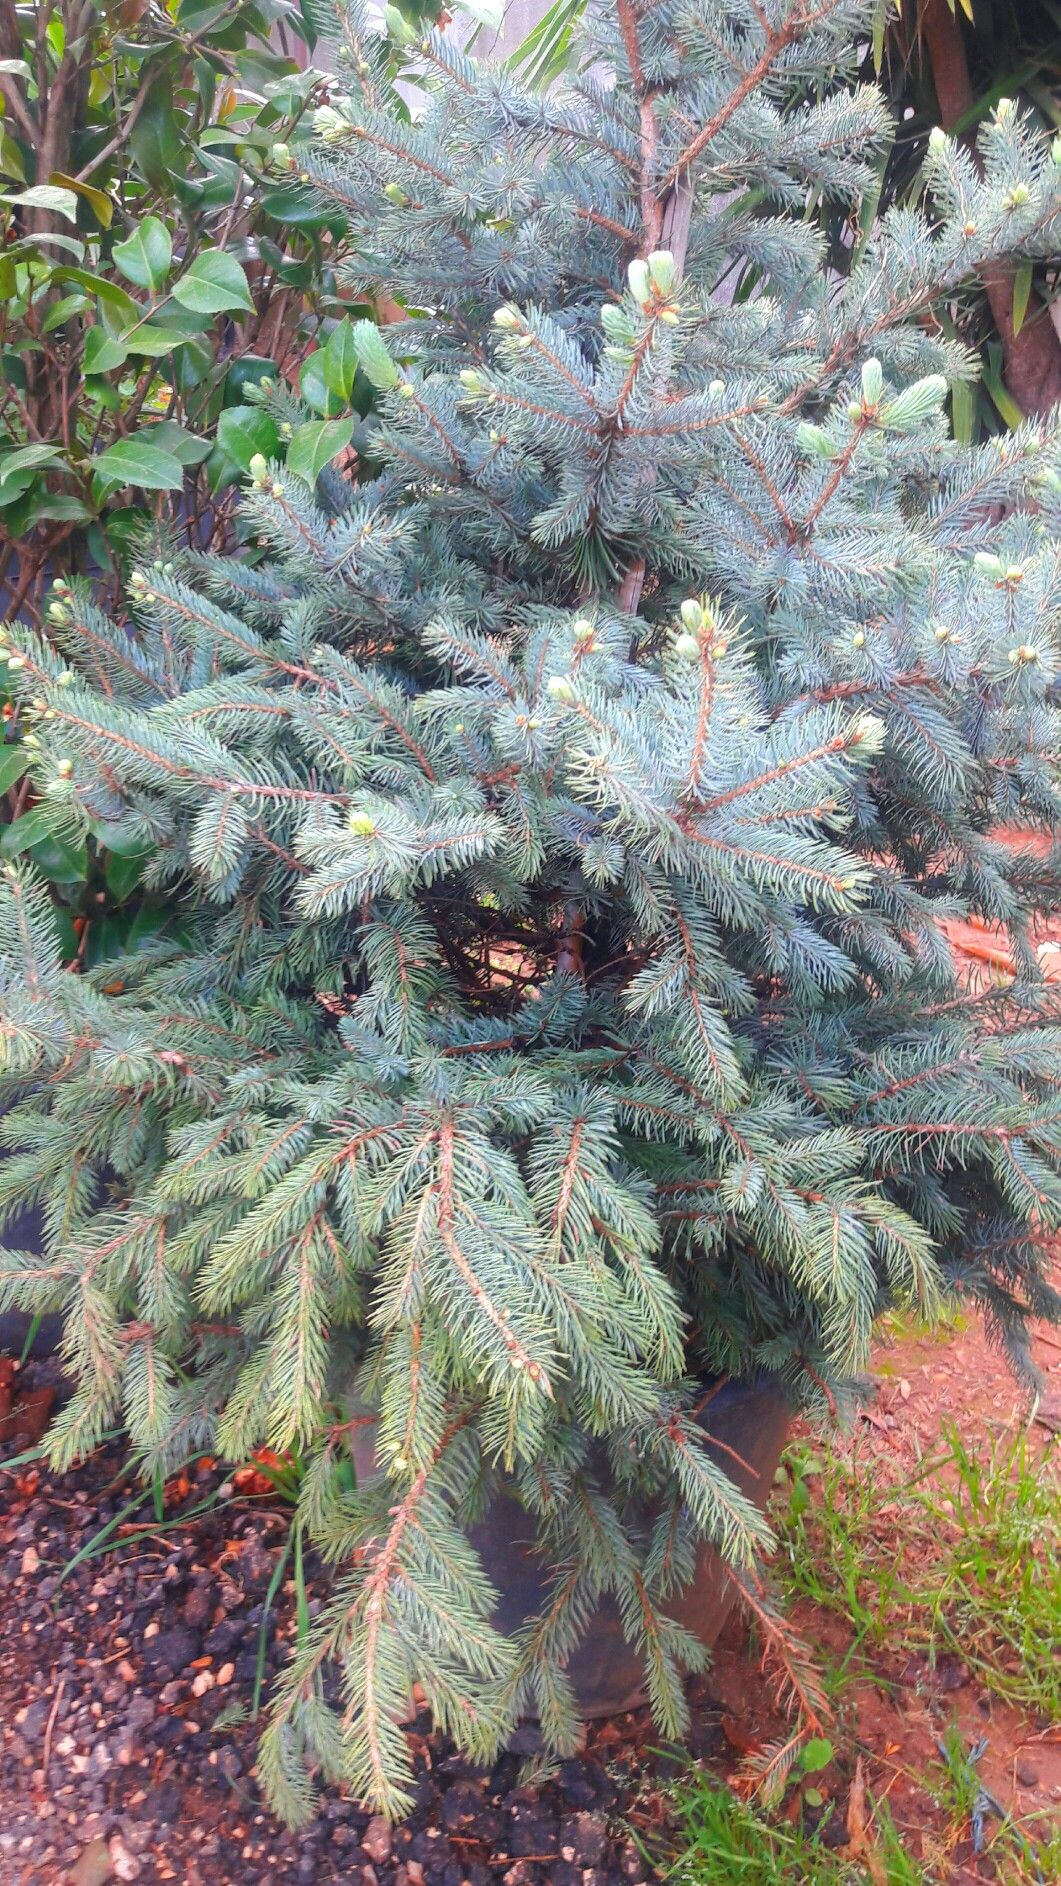 شجرة الياسمين Home Decor Decals Decor Home Decor